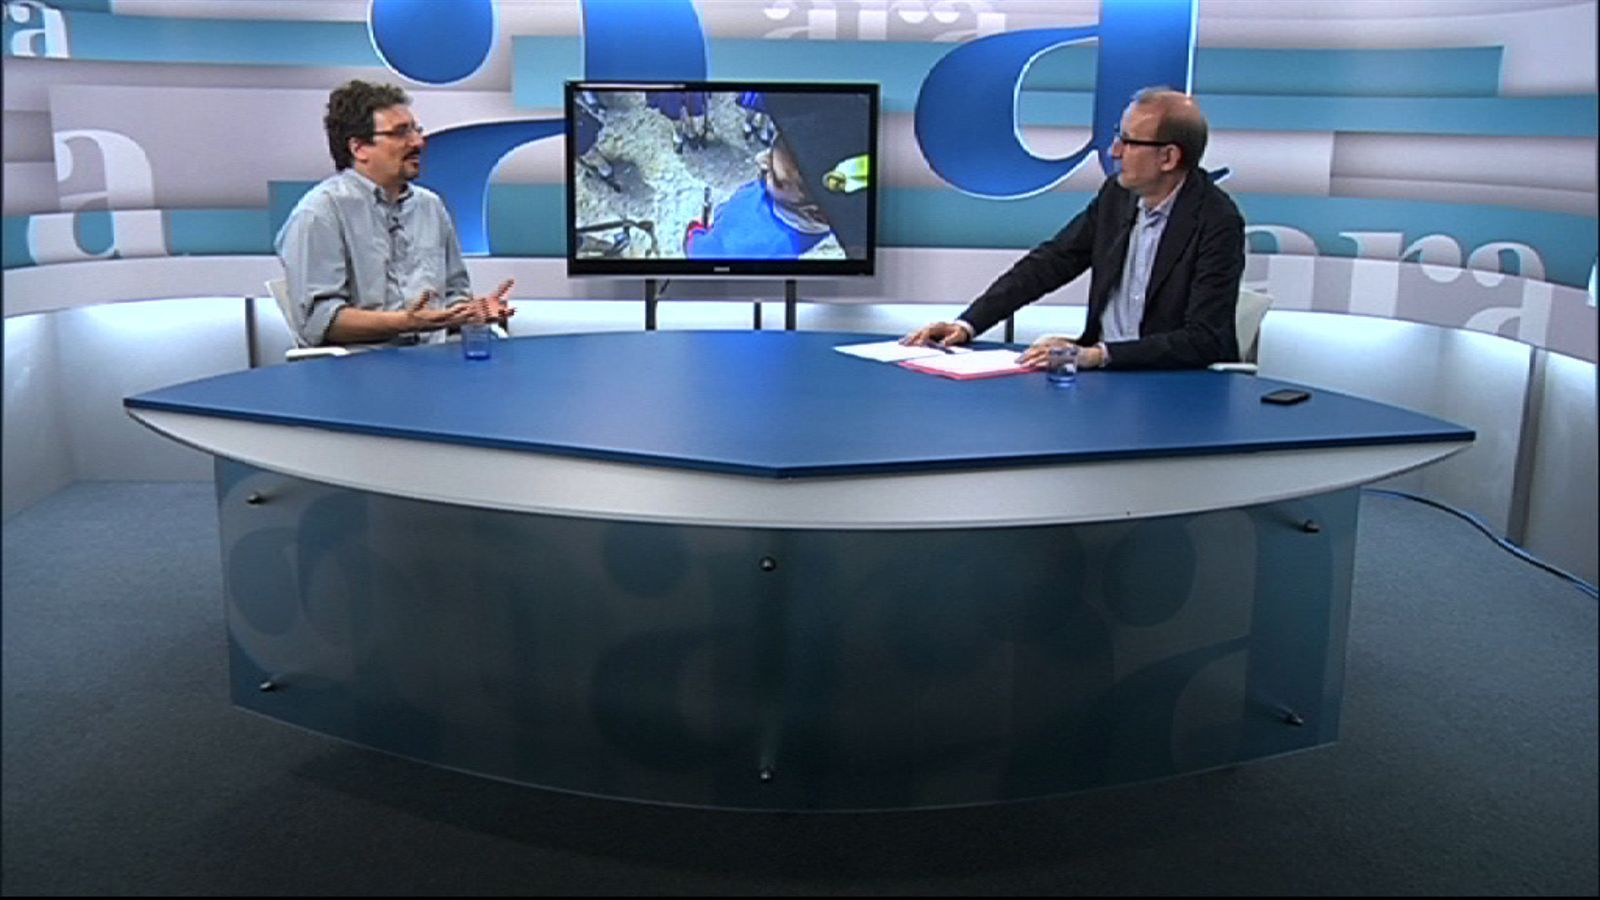 Entrevista d'Antoni Bassas a Albert Sánchez Piñol